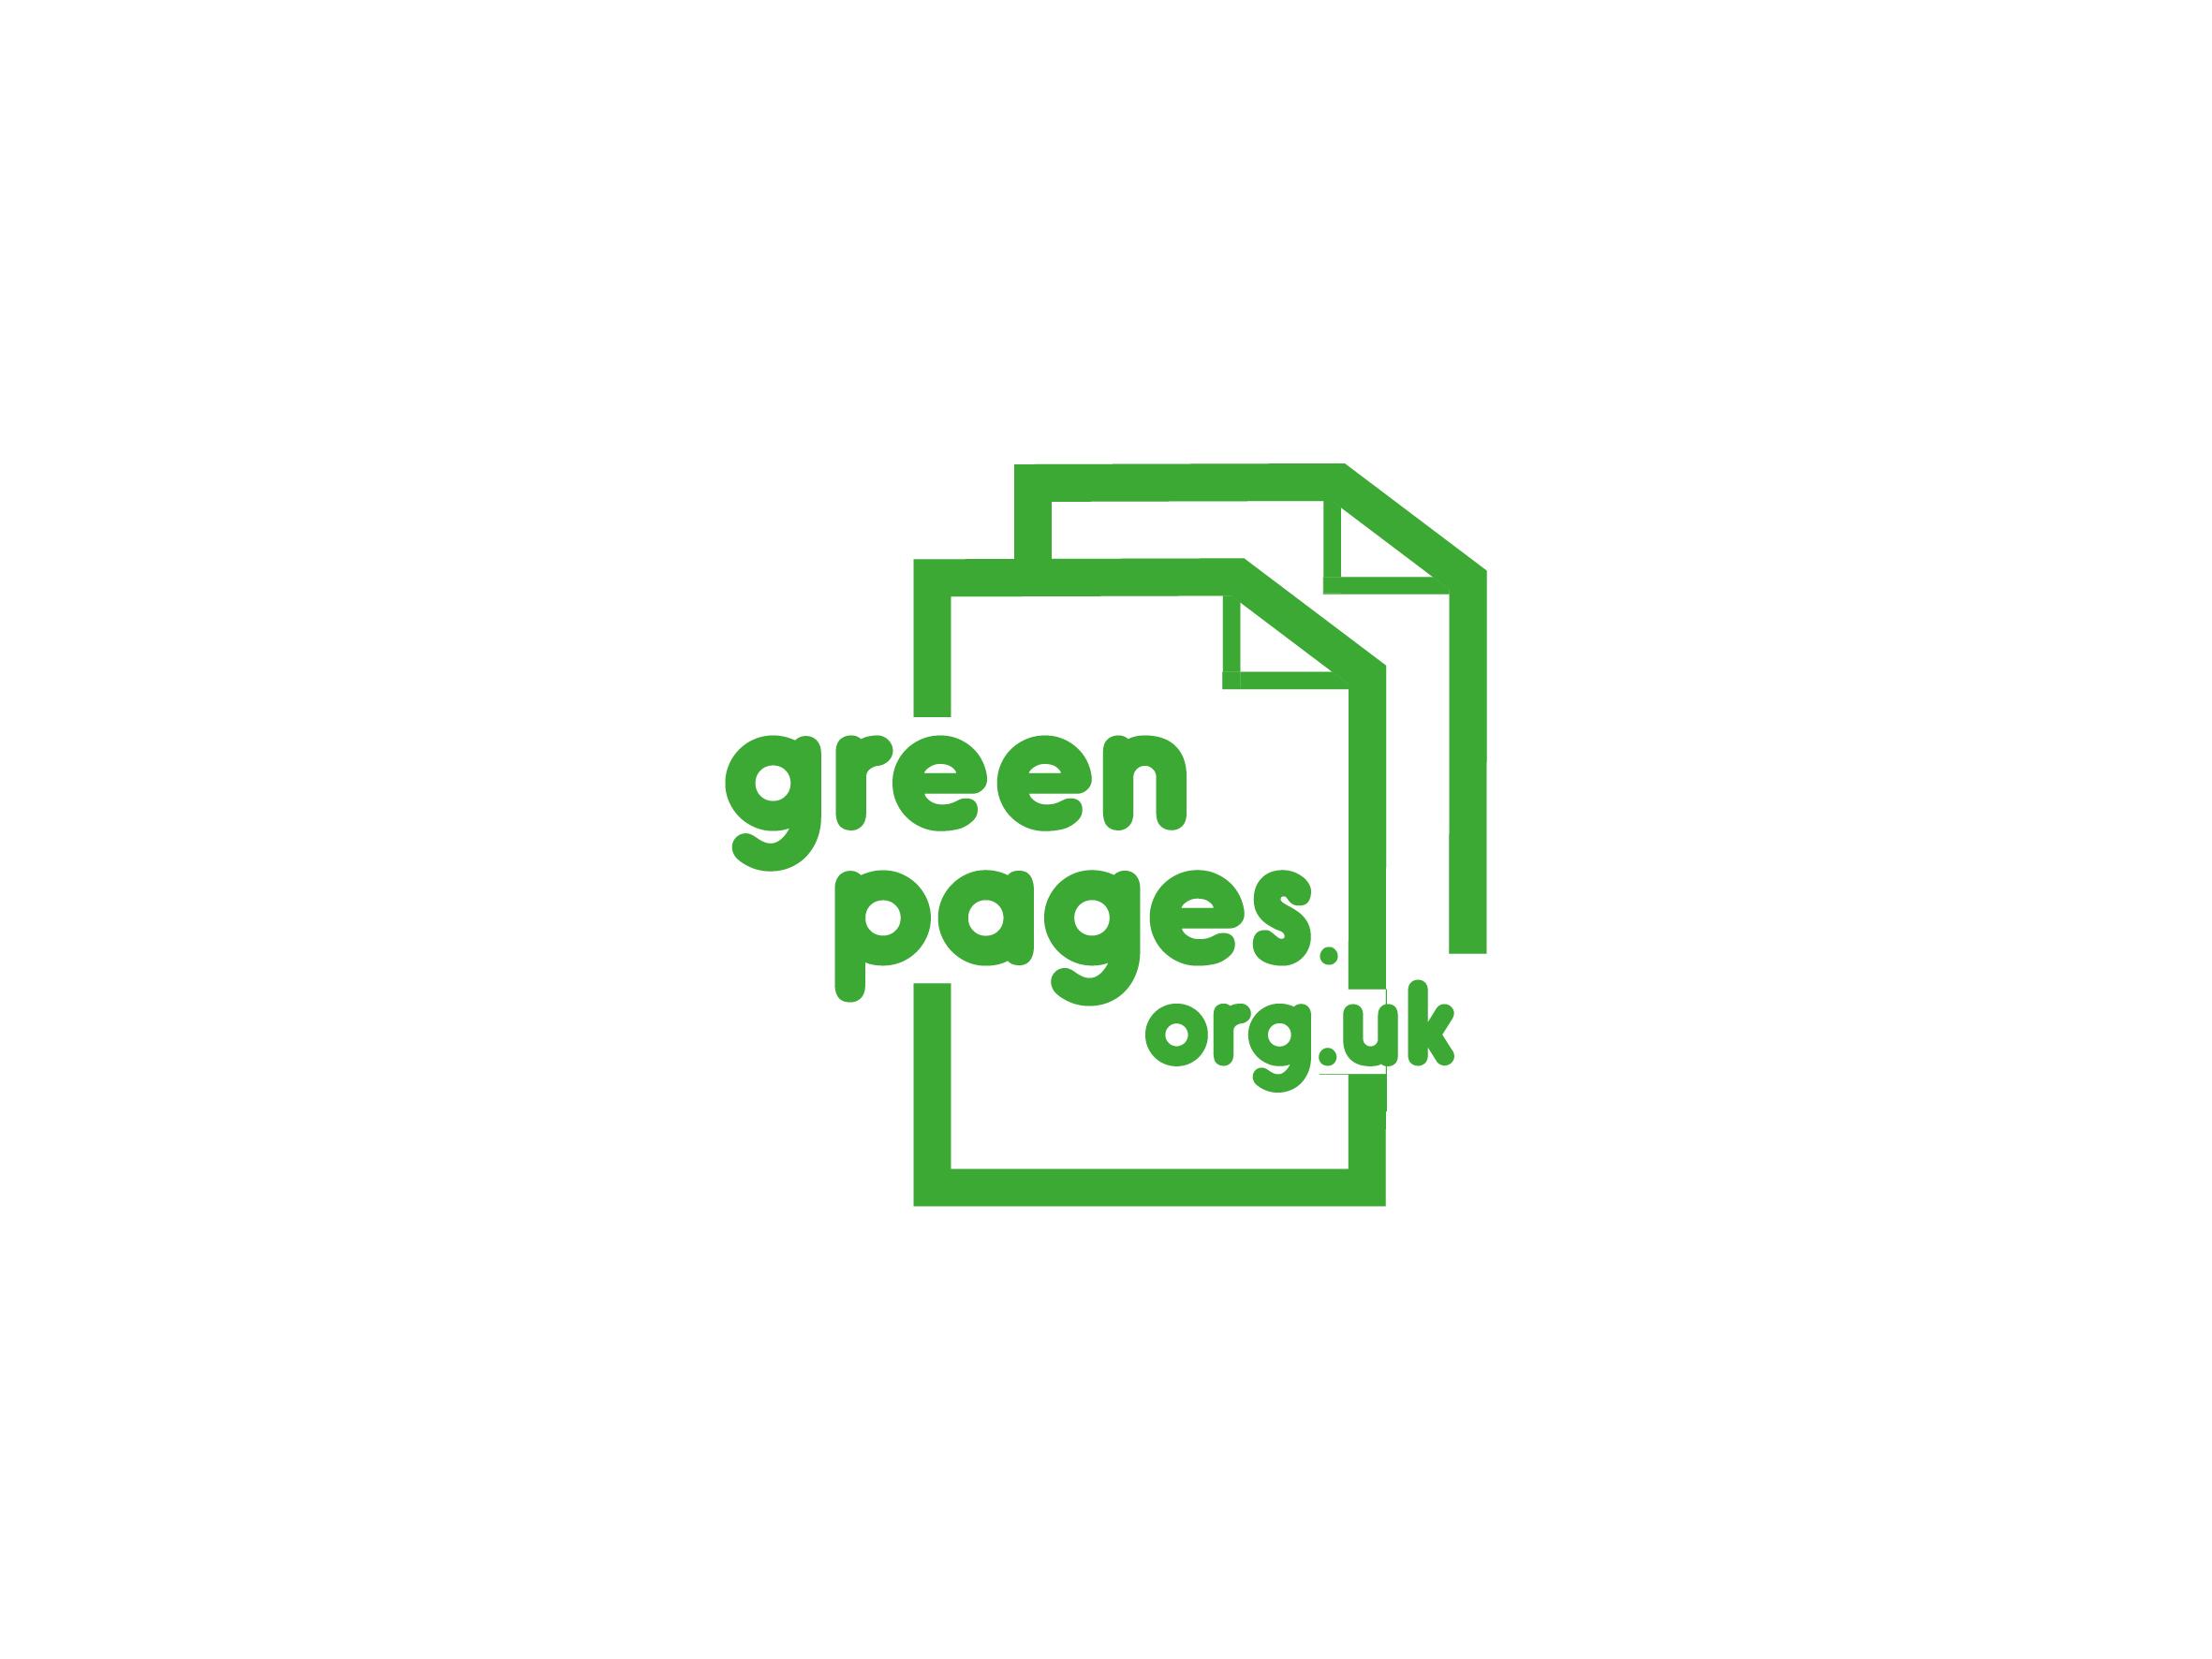 green pages logo design designed by Dakini Design Saltaire, Shipley, Bradford